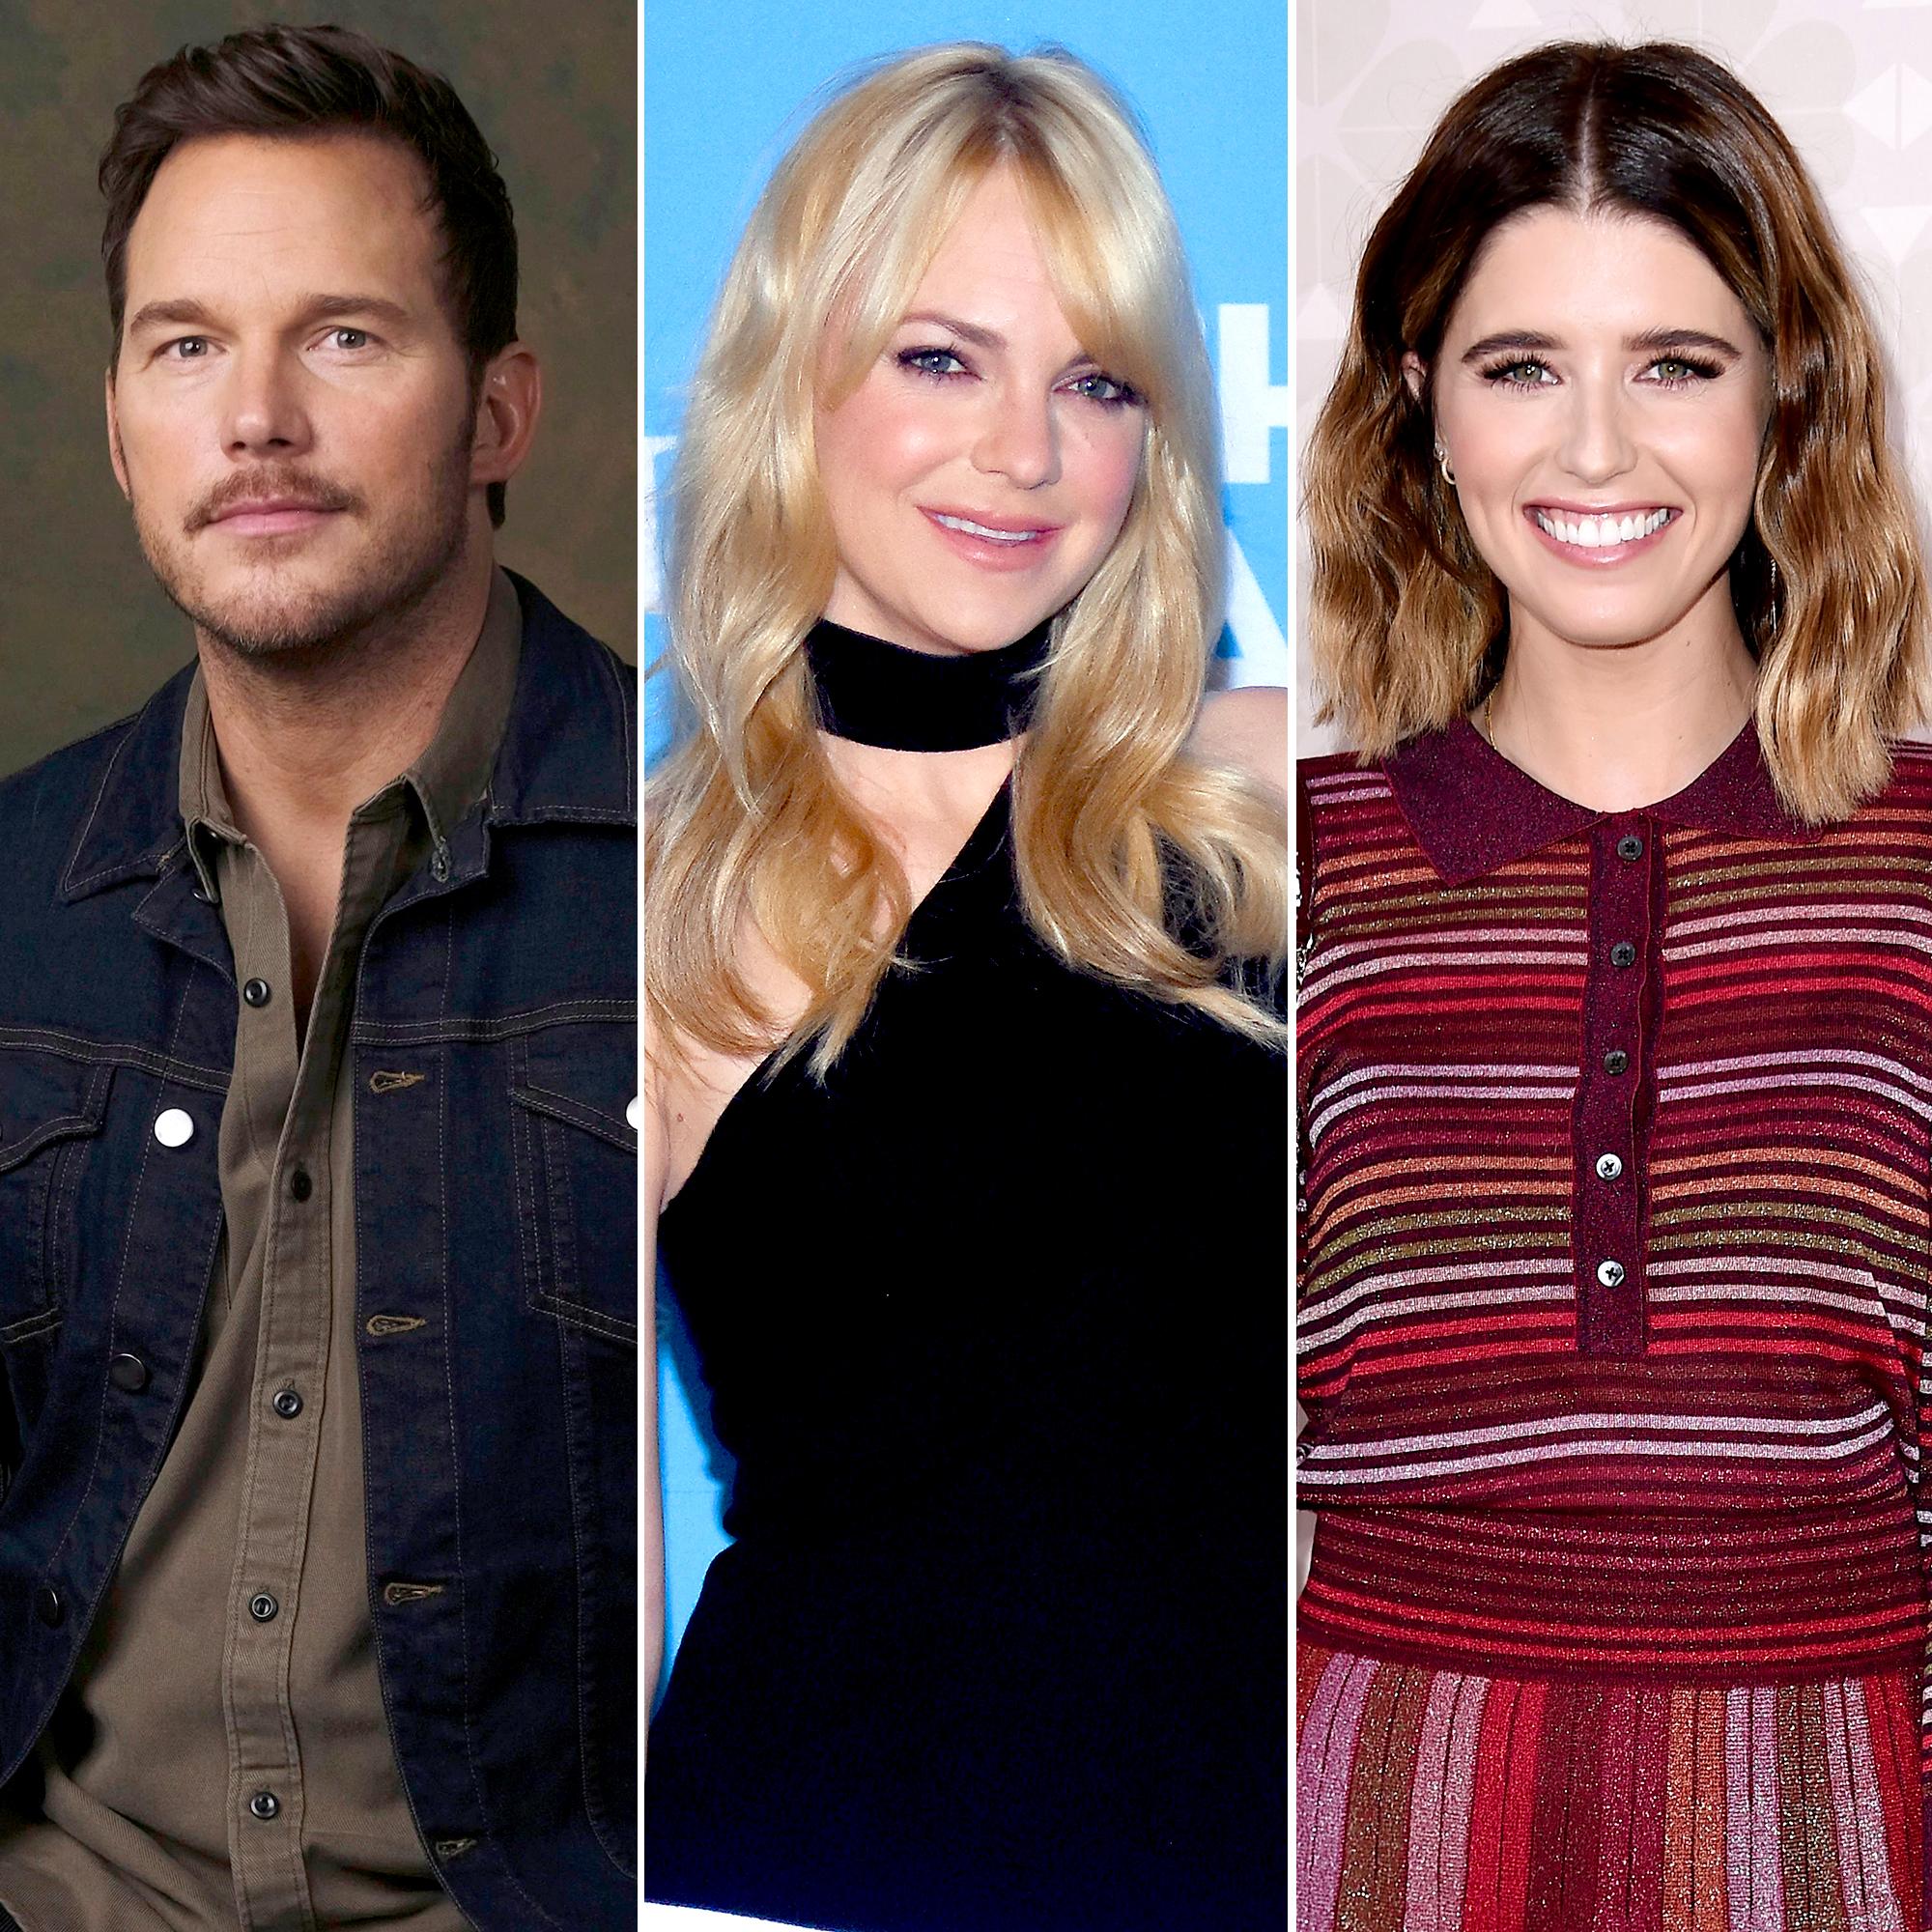 Chris-Pratt-Never-Felt-'Good-Enough'-for-Ex-Anna-Faris--He-Was-'Insecure'-Before-Katherine-Schwarzenegger